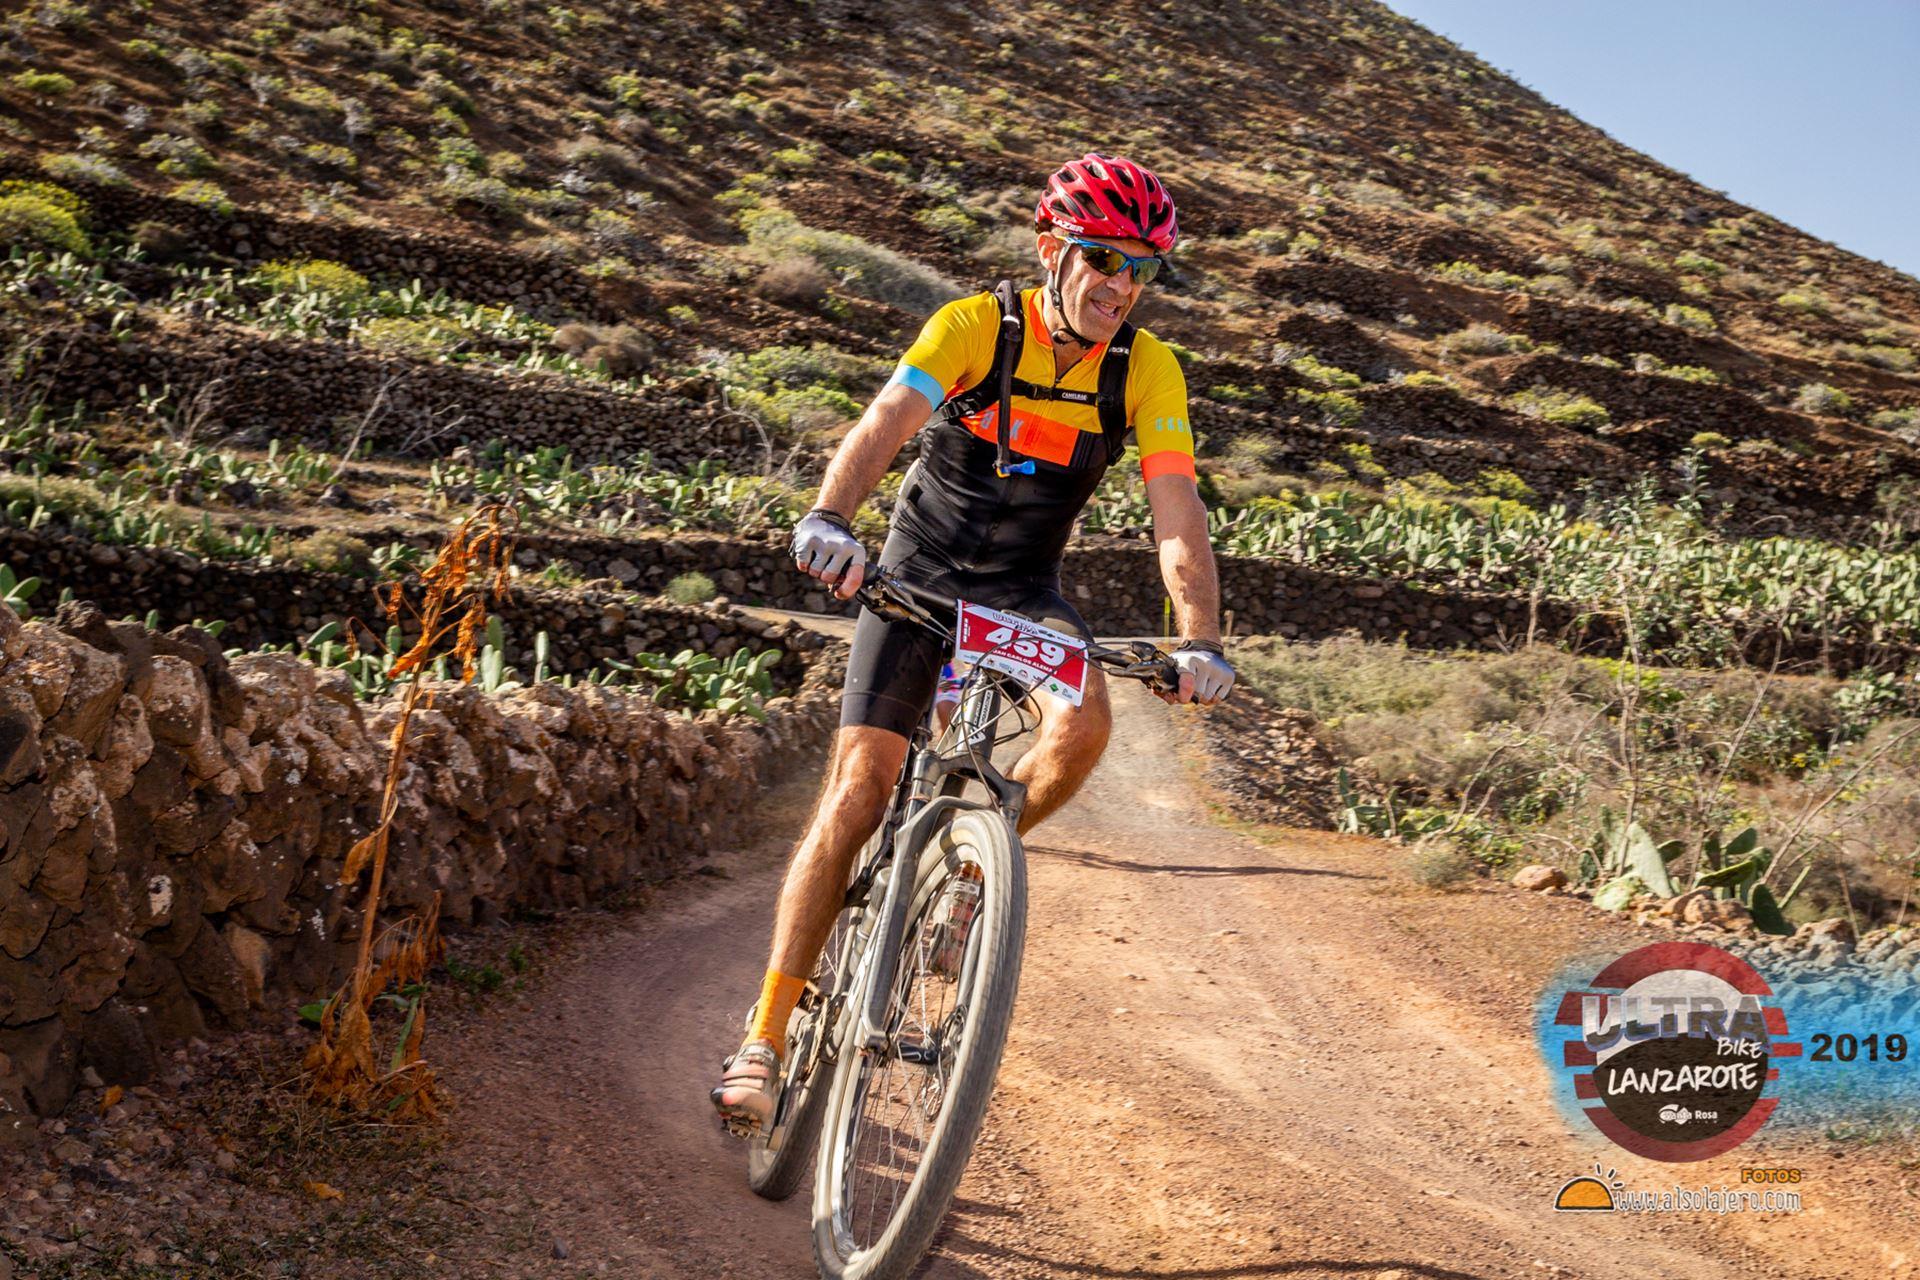 Sector Guatiza 2ª Etapa Ultrabike 2019 Fotos Alsolajero.com-190